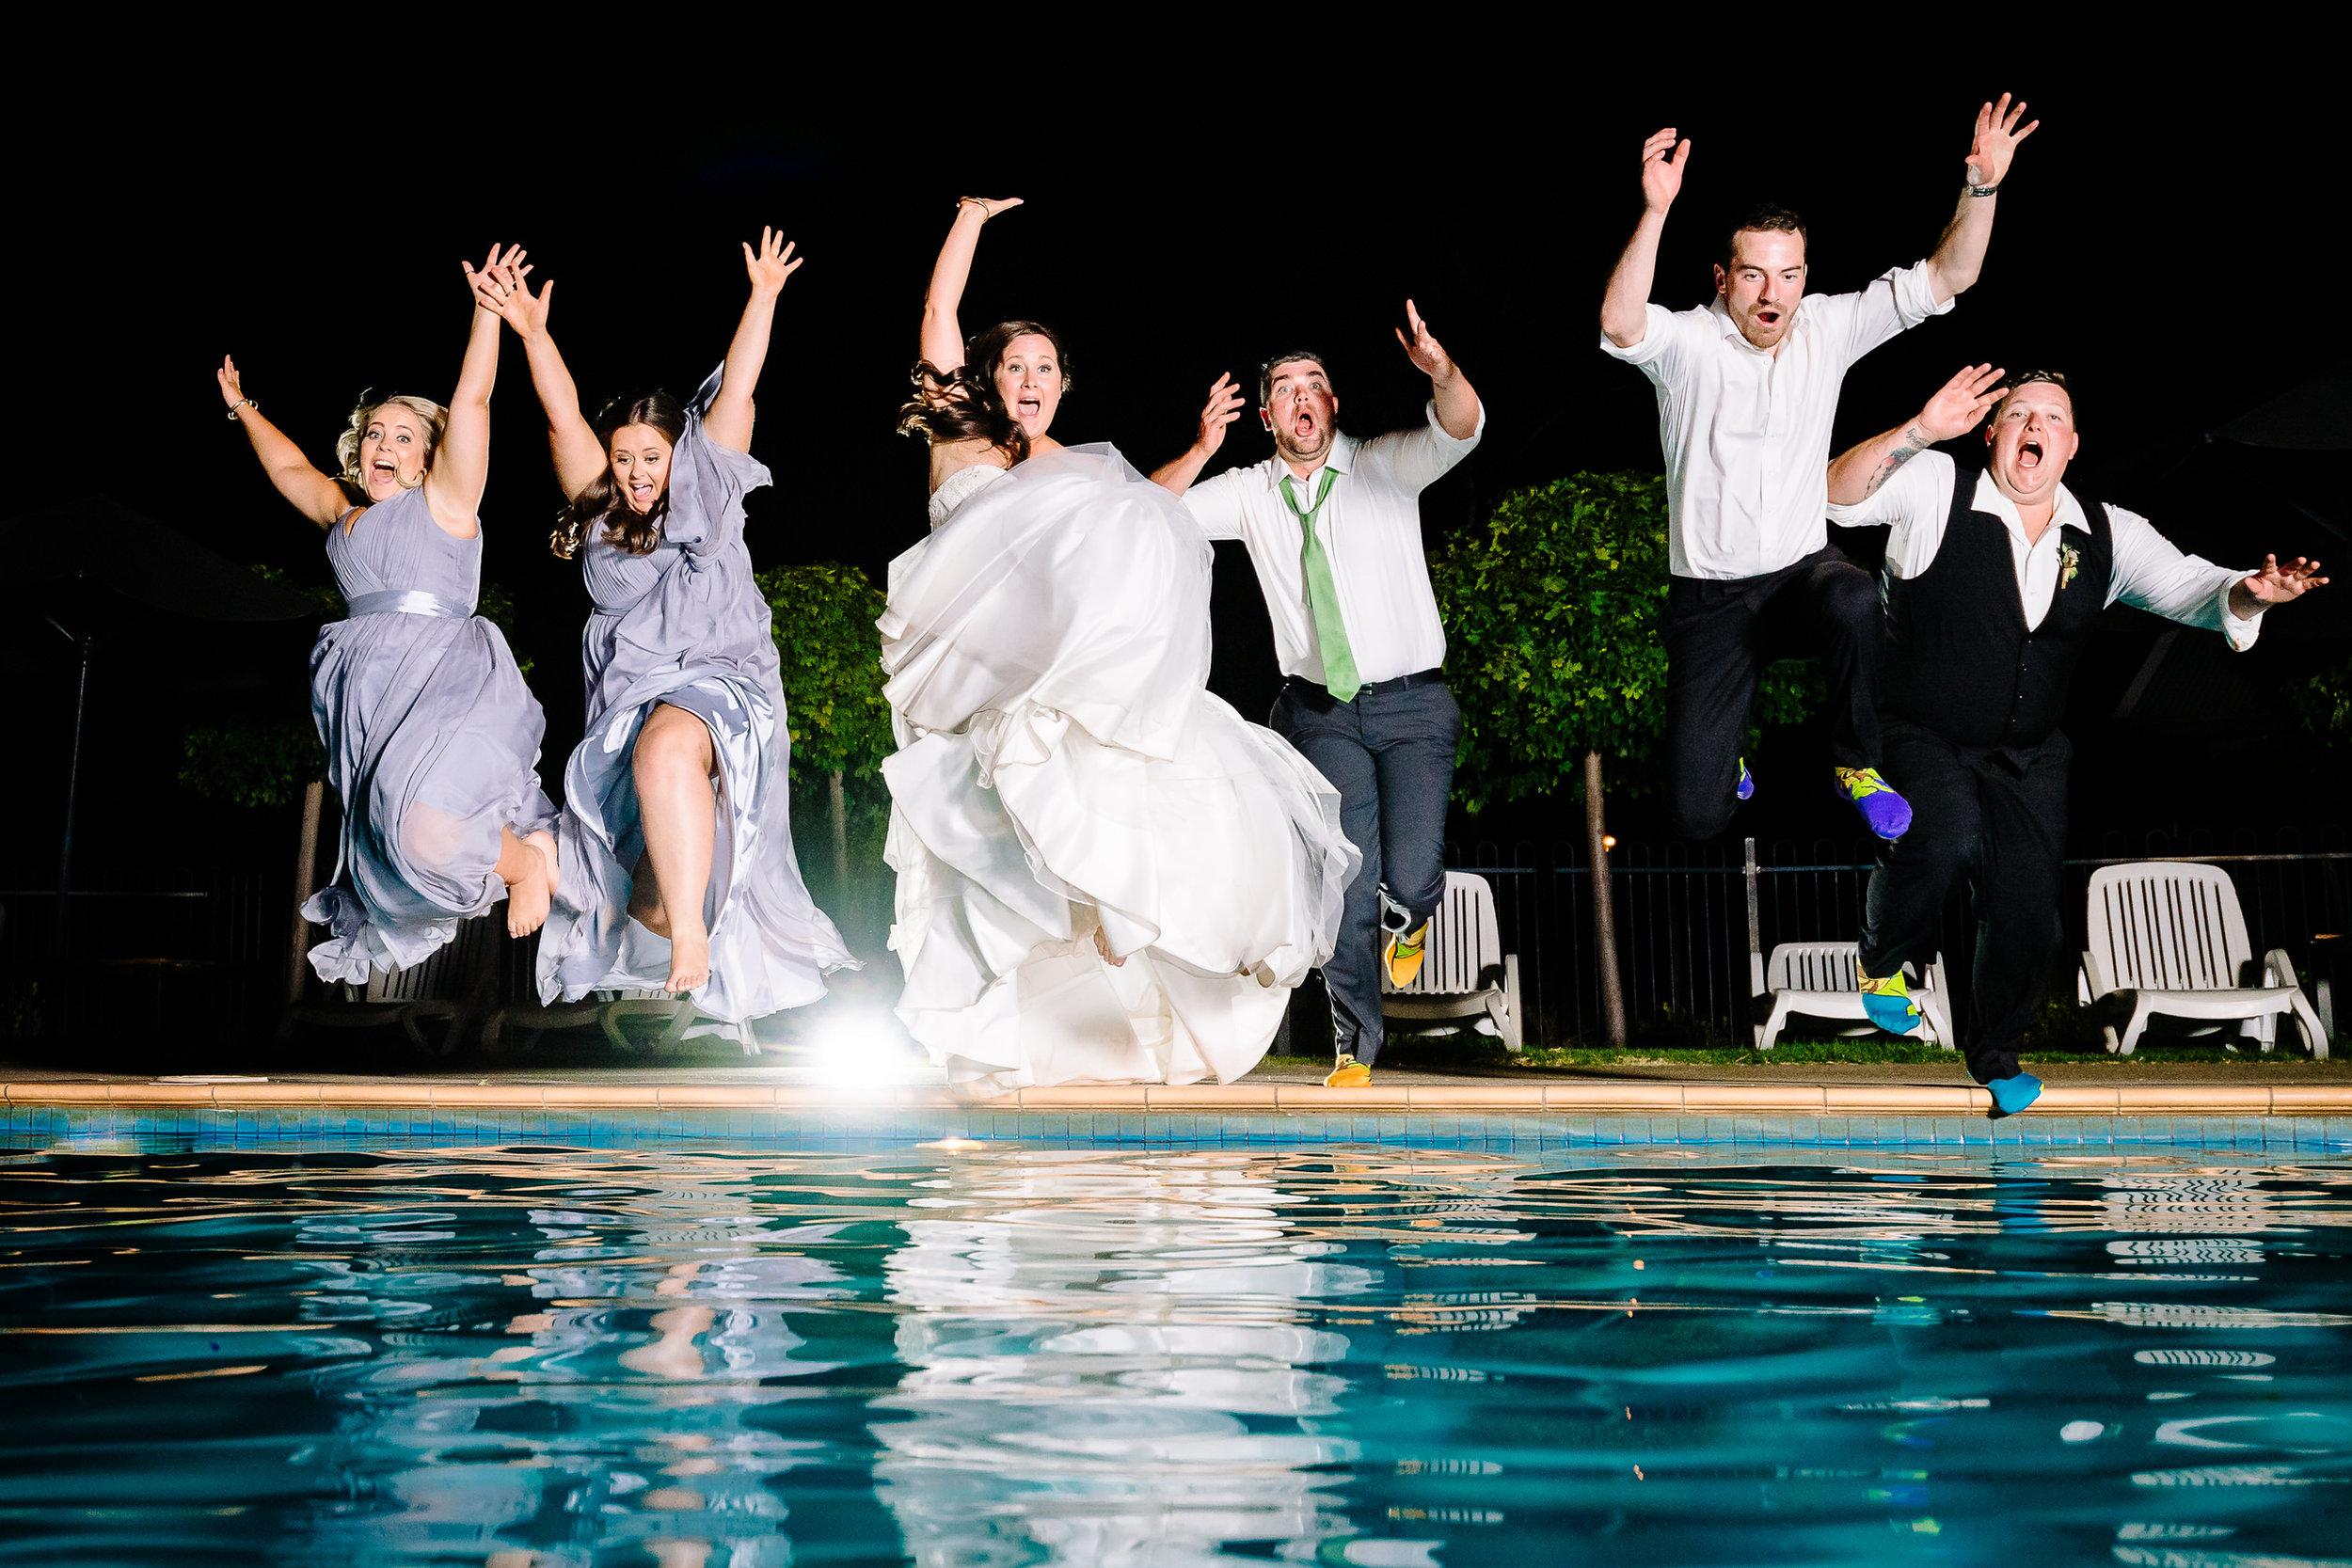 Justin_Jim_Echuca_Wedding_Photography_Tindarra-362.JPG